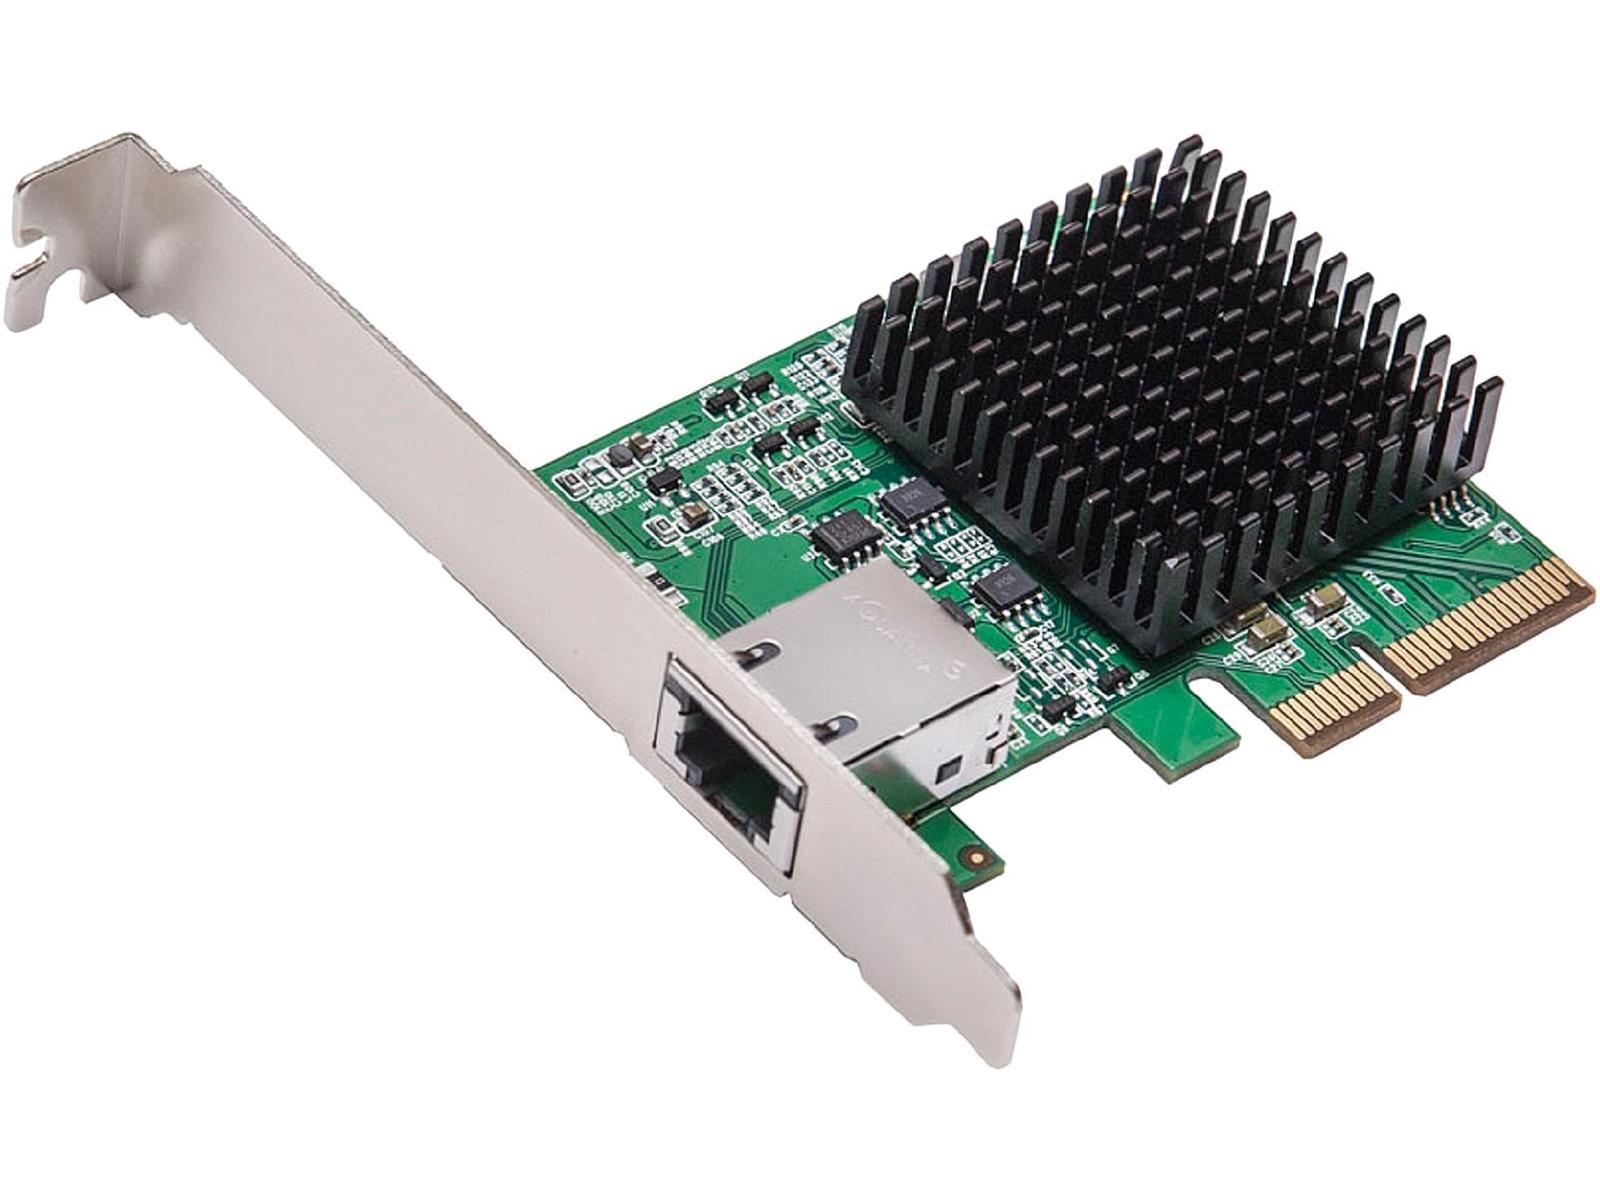 Syba SD-PEX24055 PCIe x4 10 Gbit/s Network Adapter